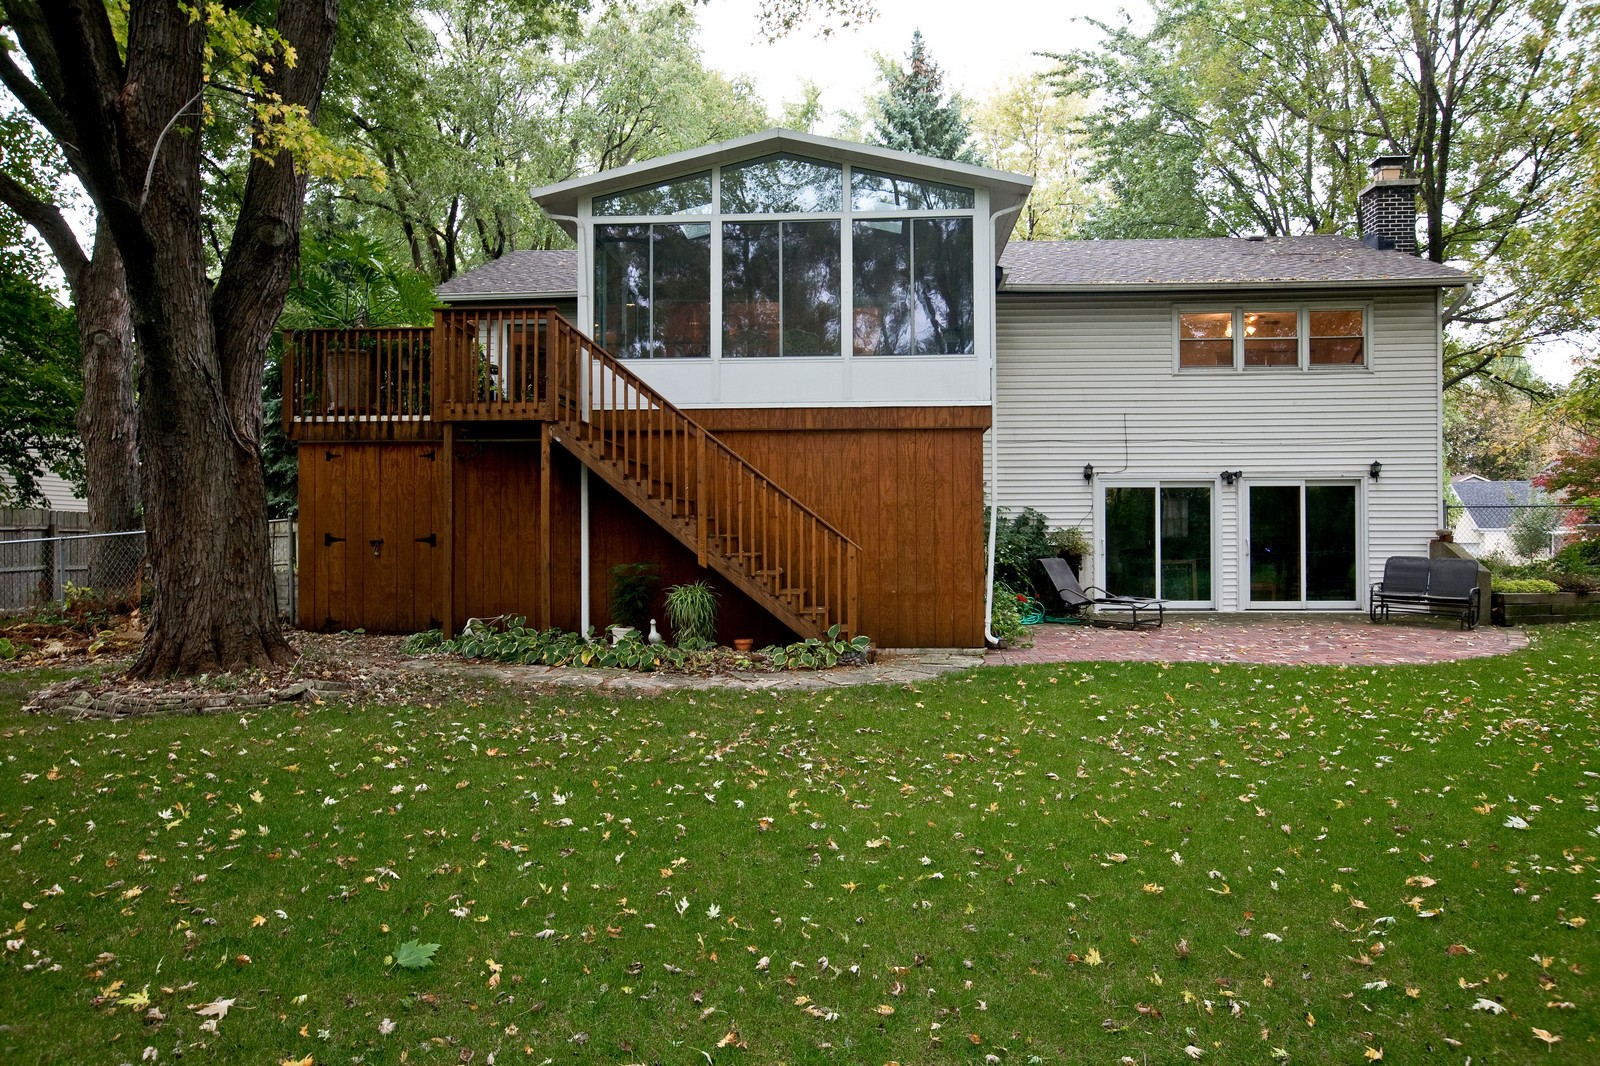 Real Estate Photography - 4402 Black Partridge, Lisle, IL, 60532 - Rear View